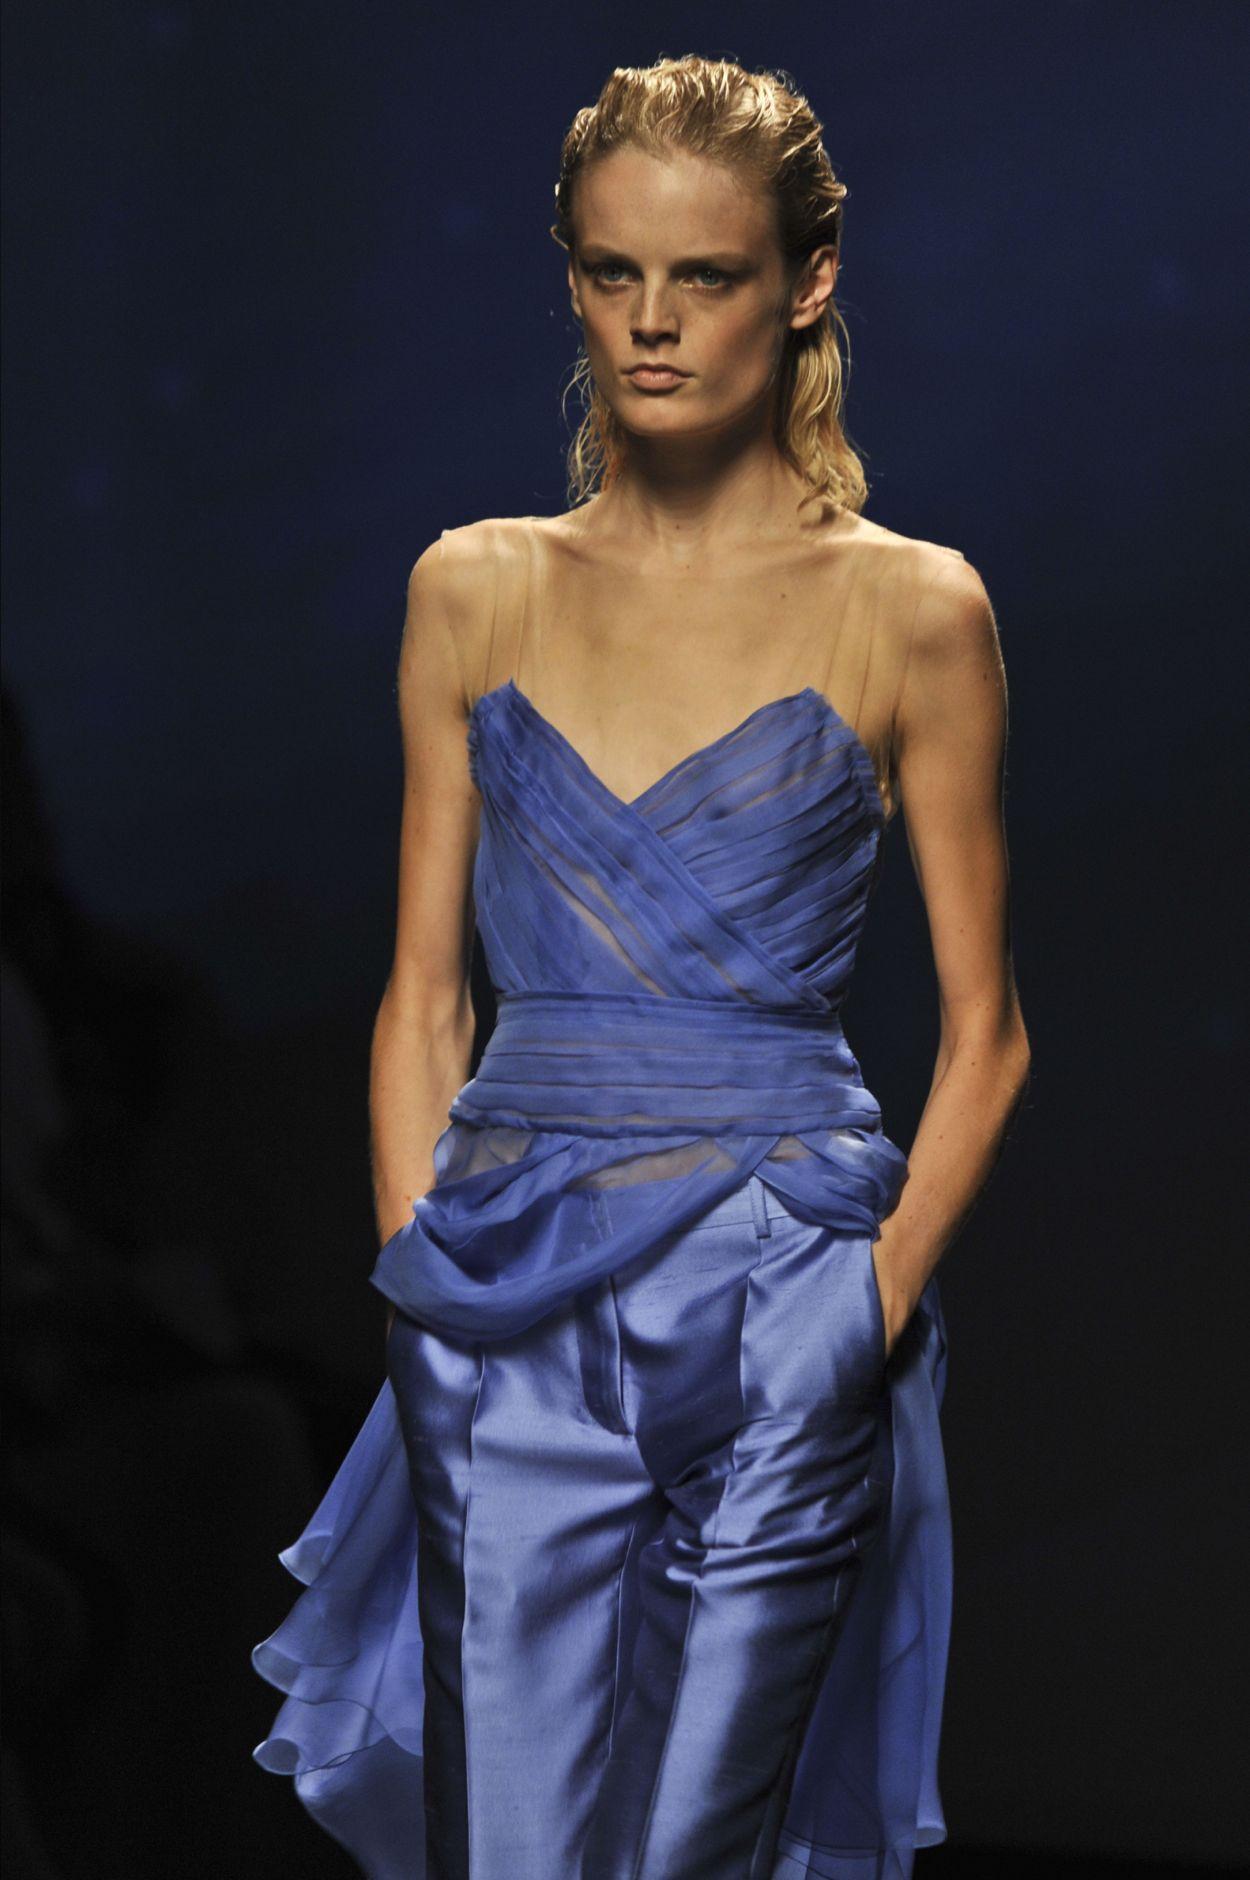 Alberta Ferretti Summer 2013 Collection Milano Fashion Week